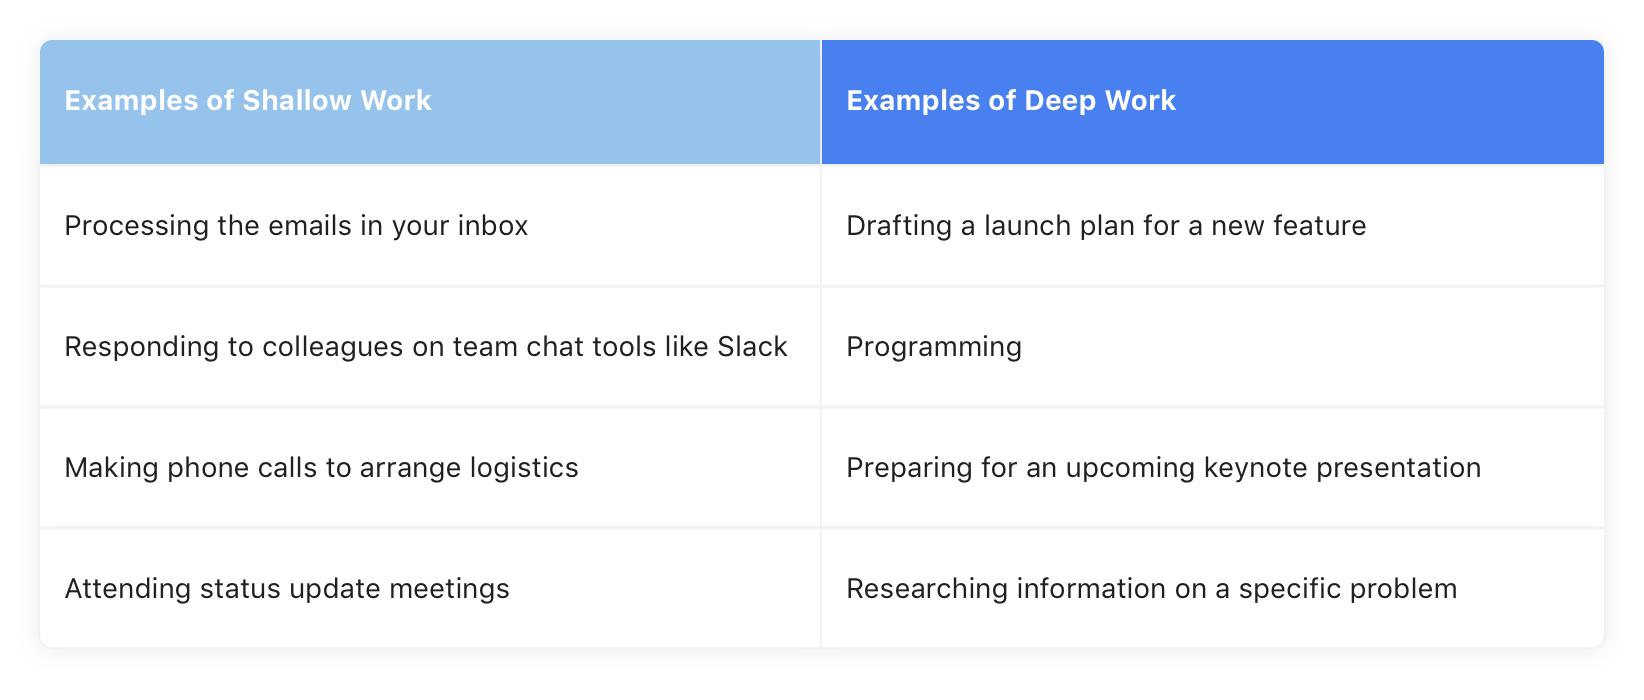 Shallow-work-vs-Deep-Work